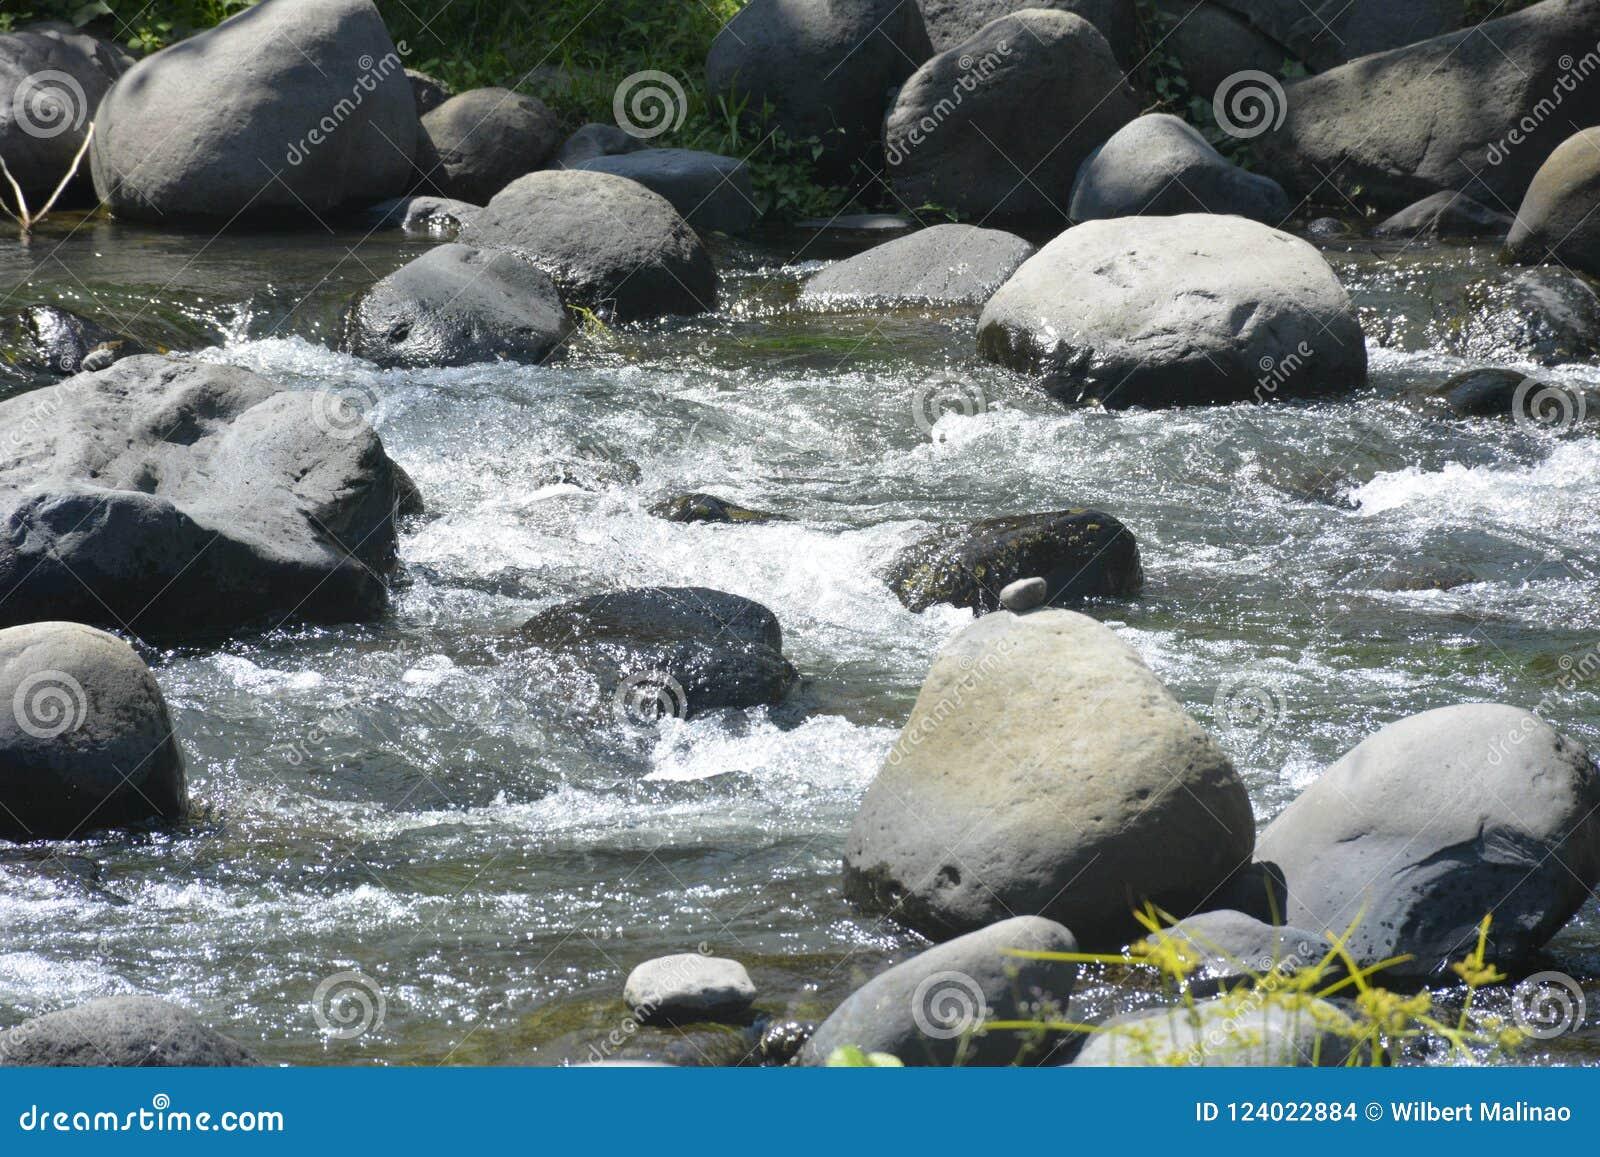 Leito fluvial situado em Ruparan barangay, cidade de Ruparan de Digos, Davao del Sur, Filipinas